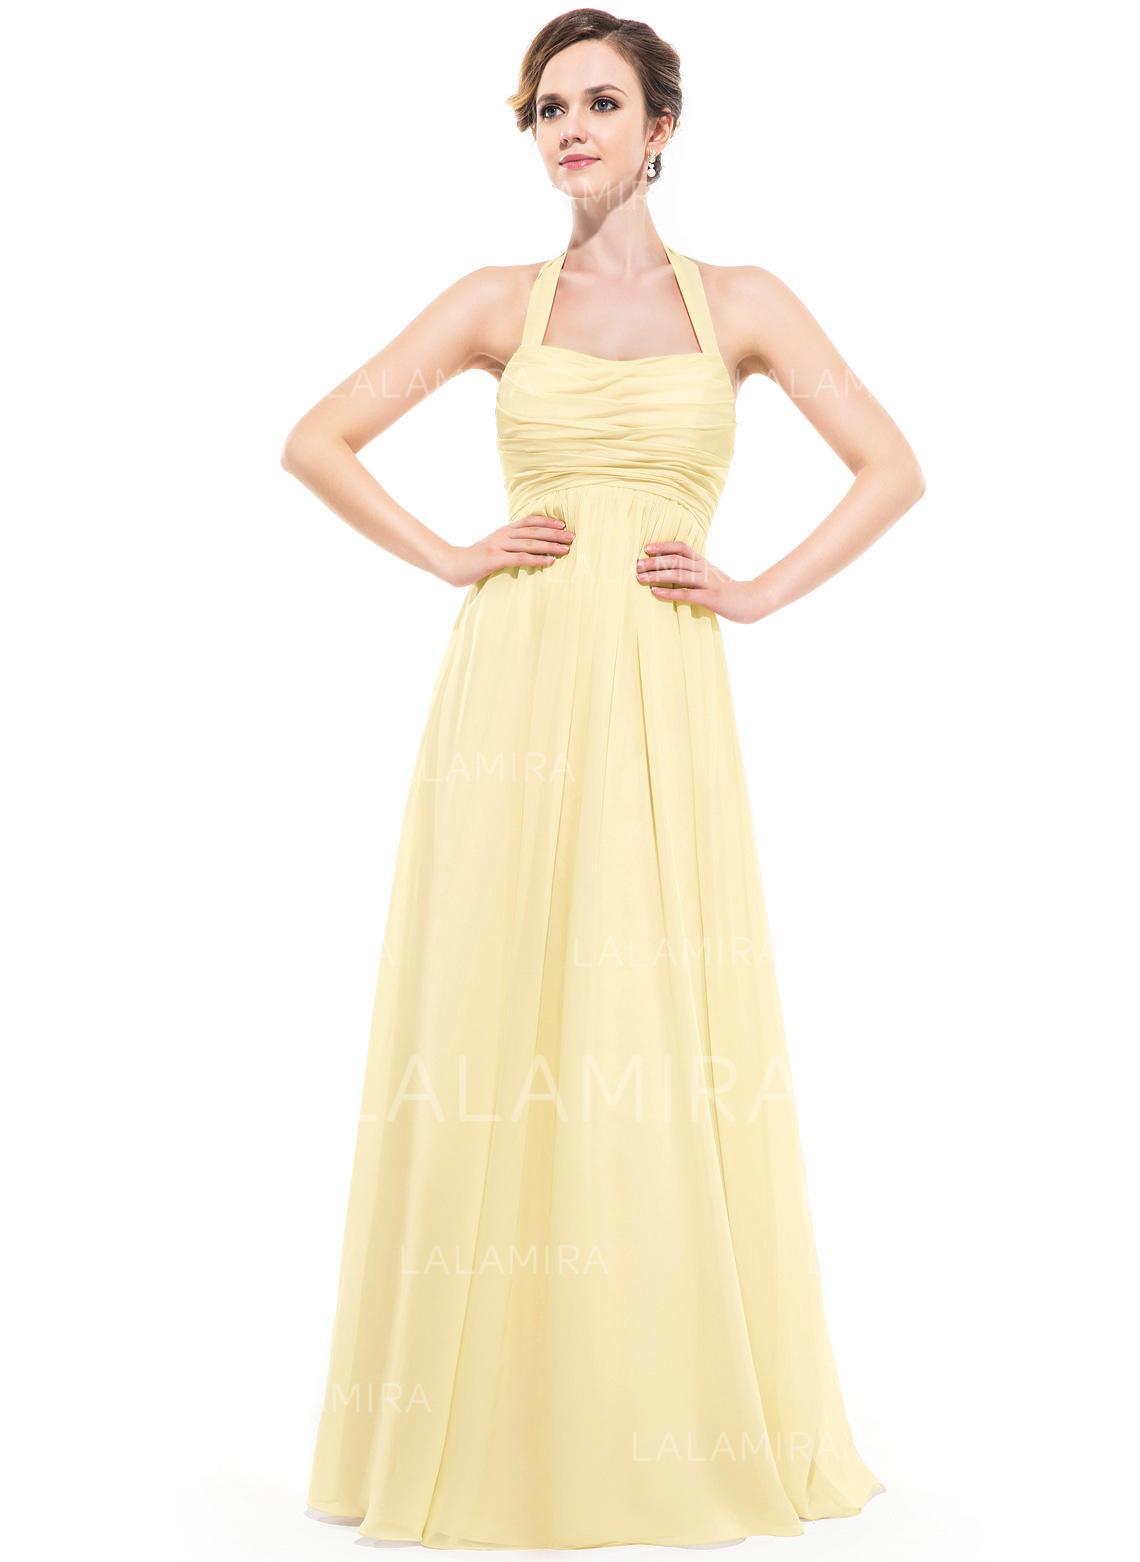 fc9cfa60acb4 Empire Chiffon Bridesmaid Dresses Ruffle Halter Sleeveless Floor-Length  (007063000). Loading zoom